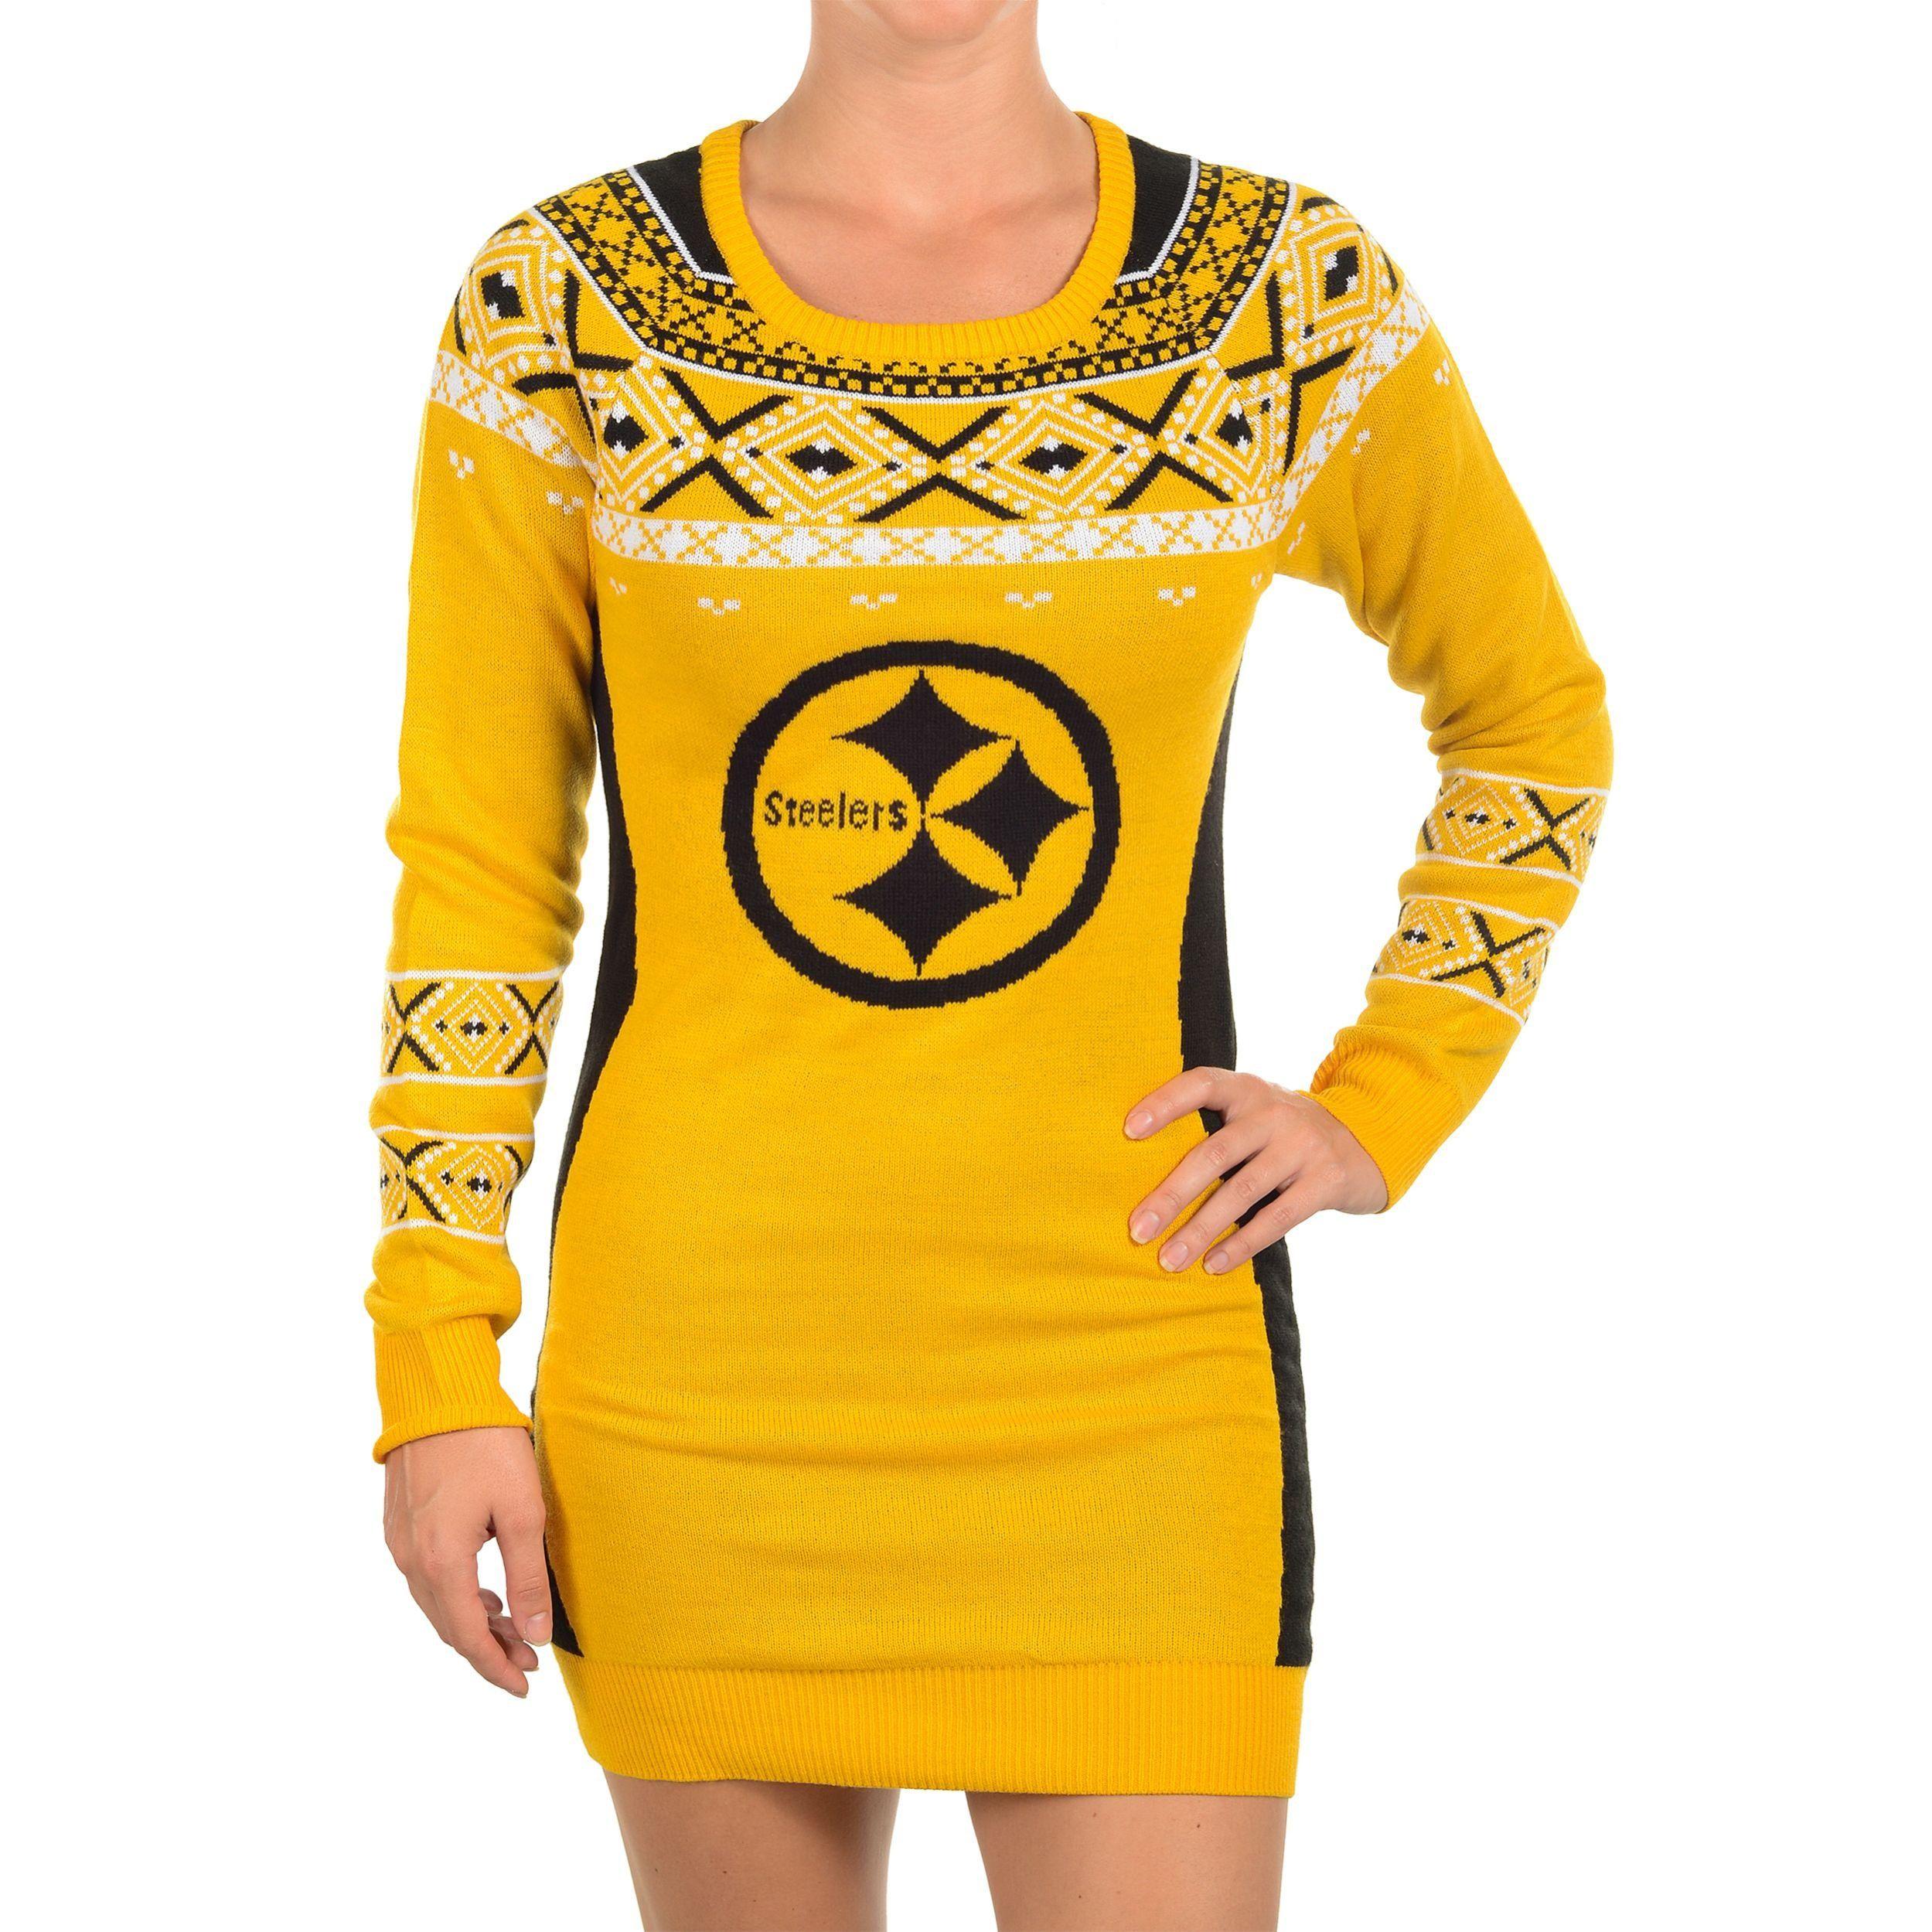 promo code 72088 cf802 Pittsburgh Steelers Ugly Christmas Sweaters | NFL Teams Ugly ...